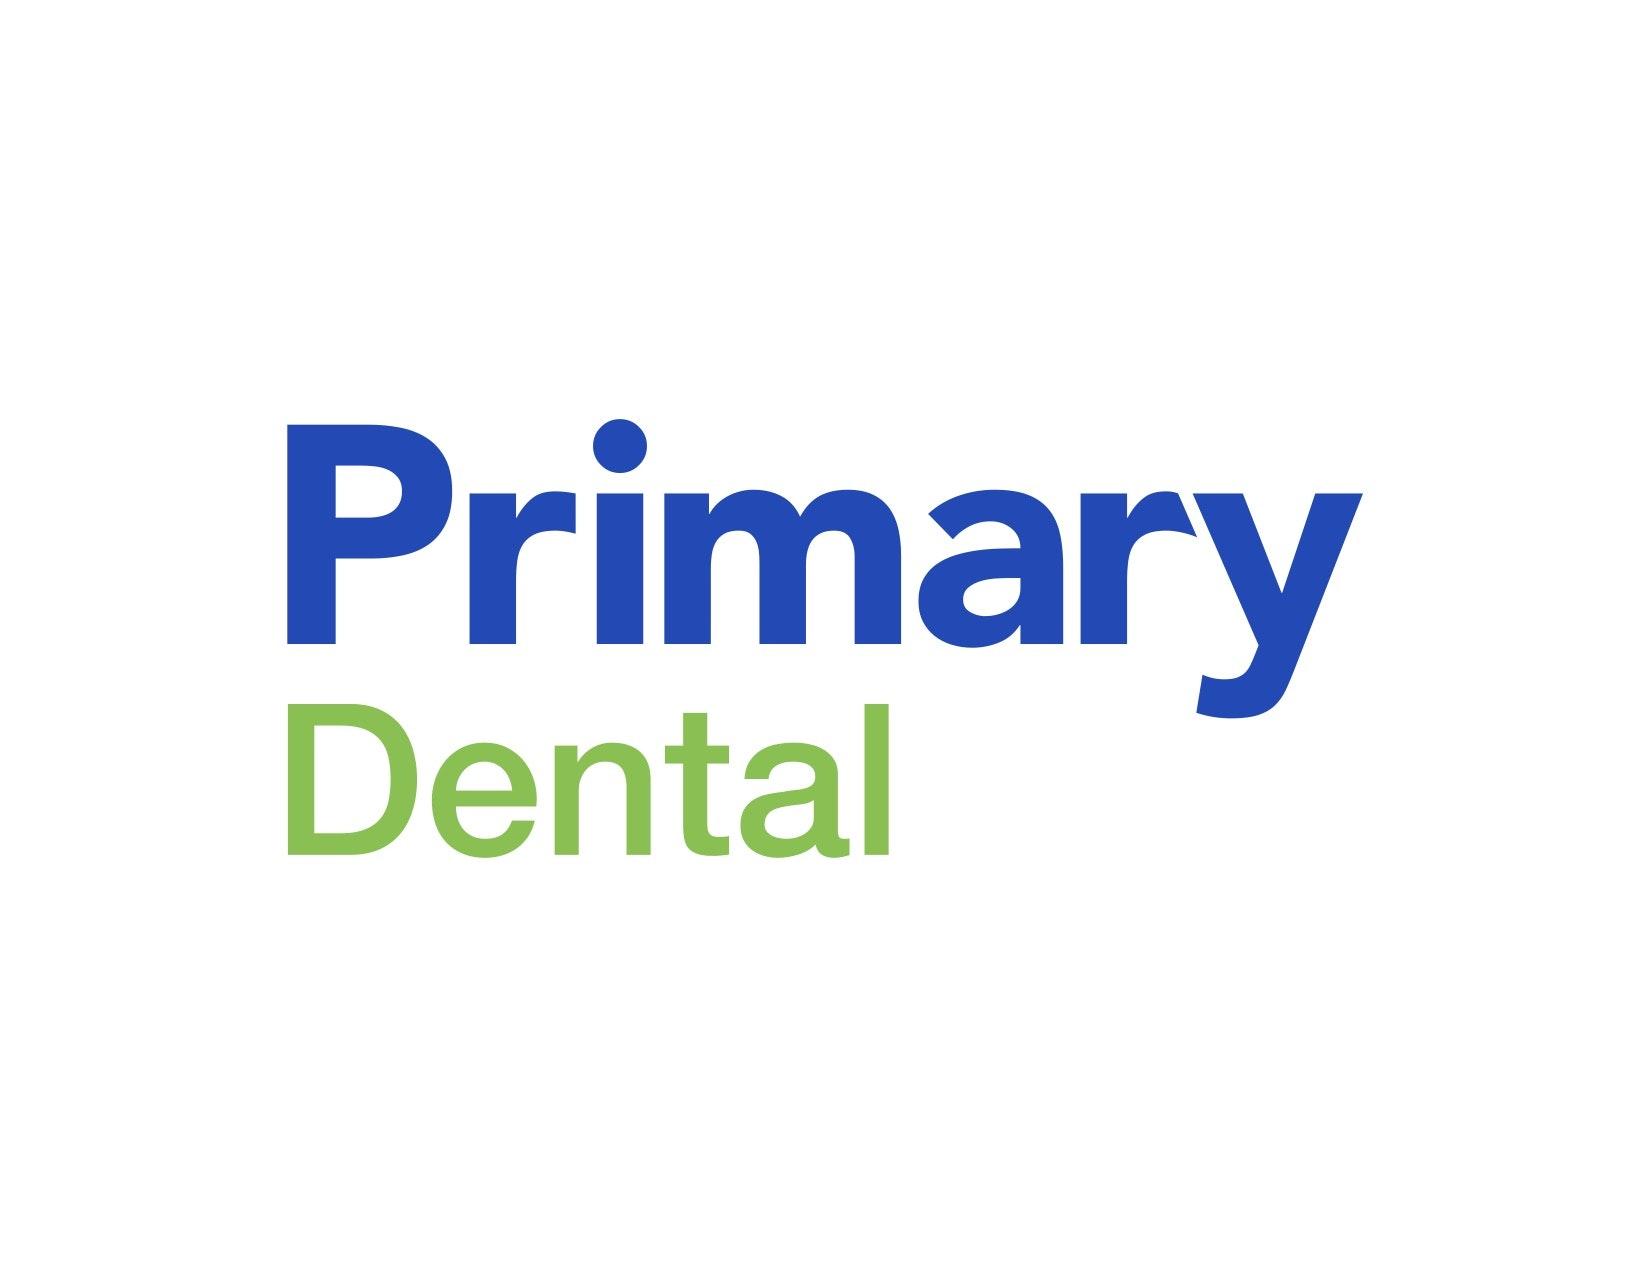 Marion Domain Medical & Dental Centre (Primary Dental)